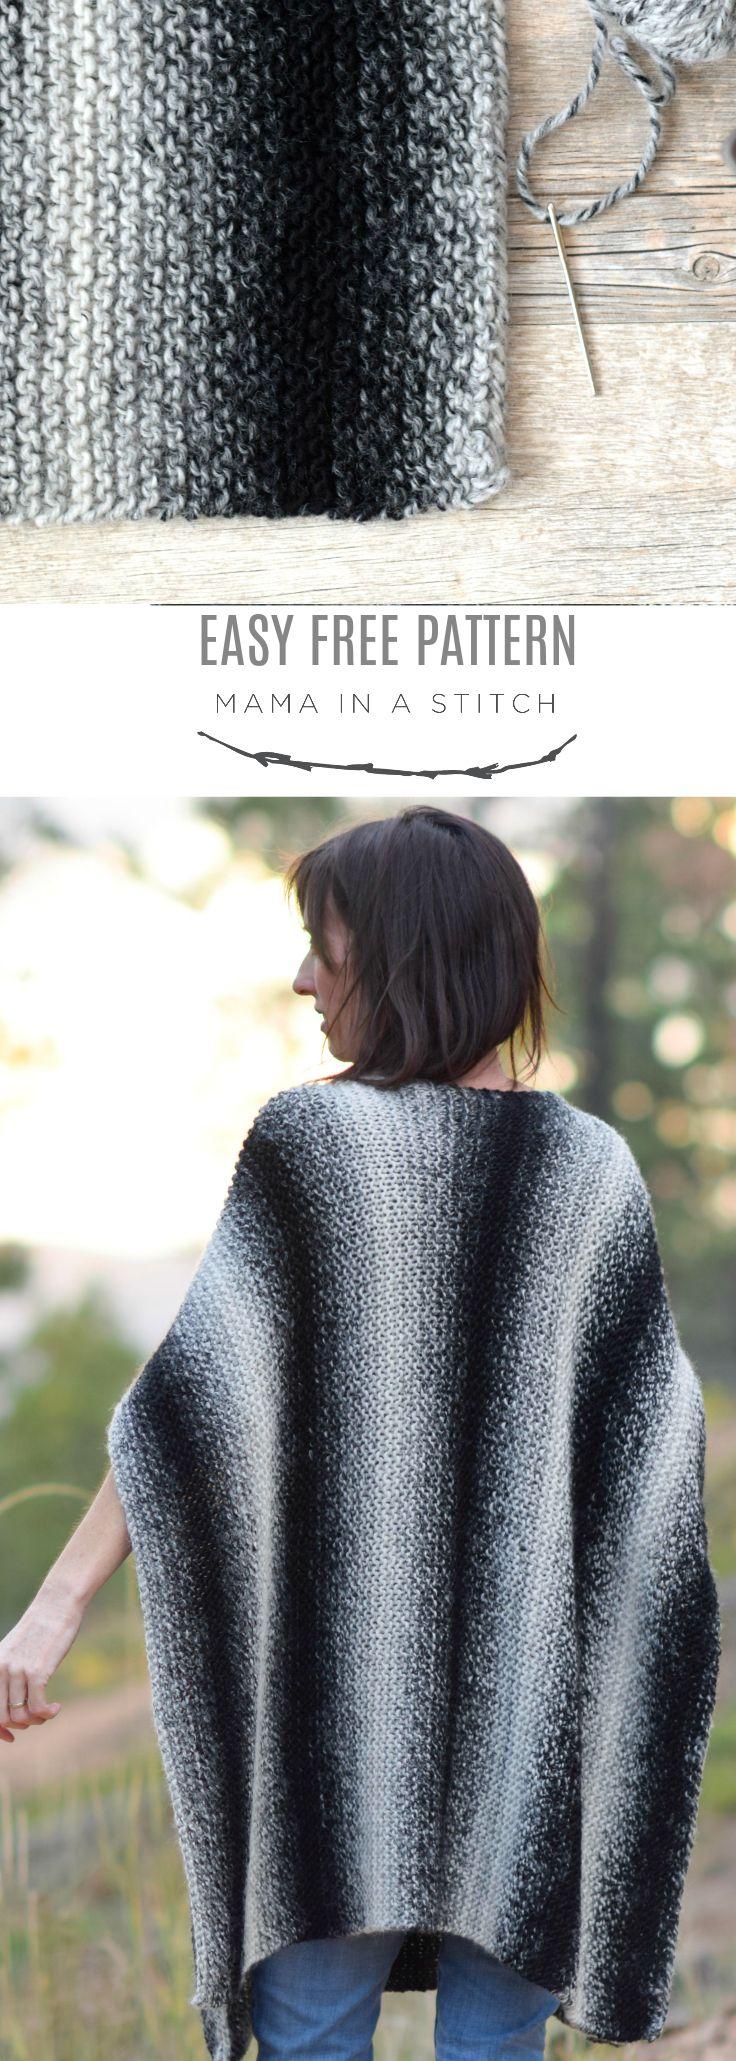 Aspen Relaxed Knit Poncho Pattern via @MamaInAStitch | Knitting ...